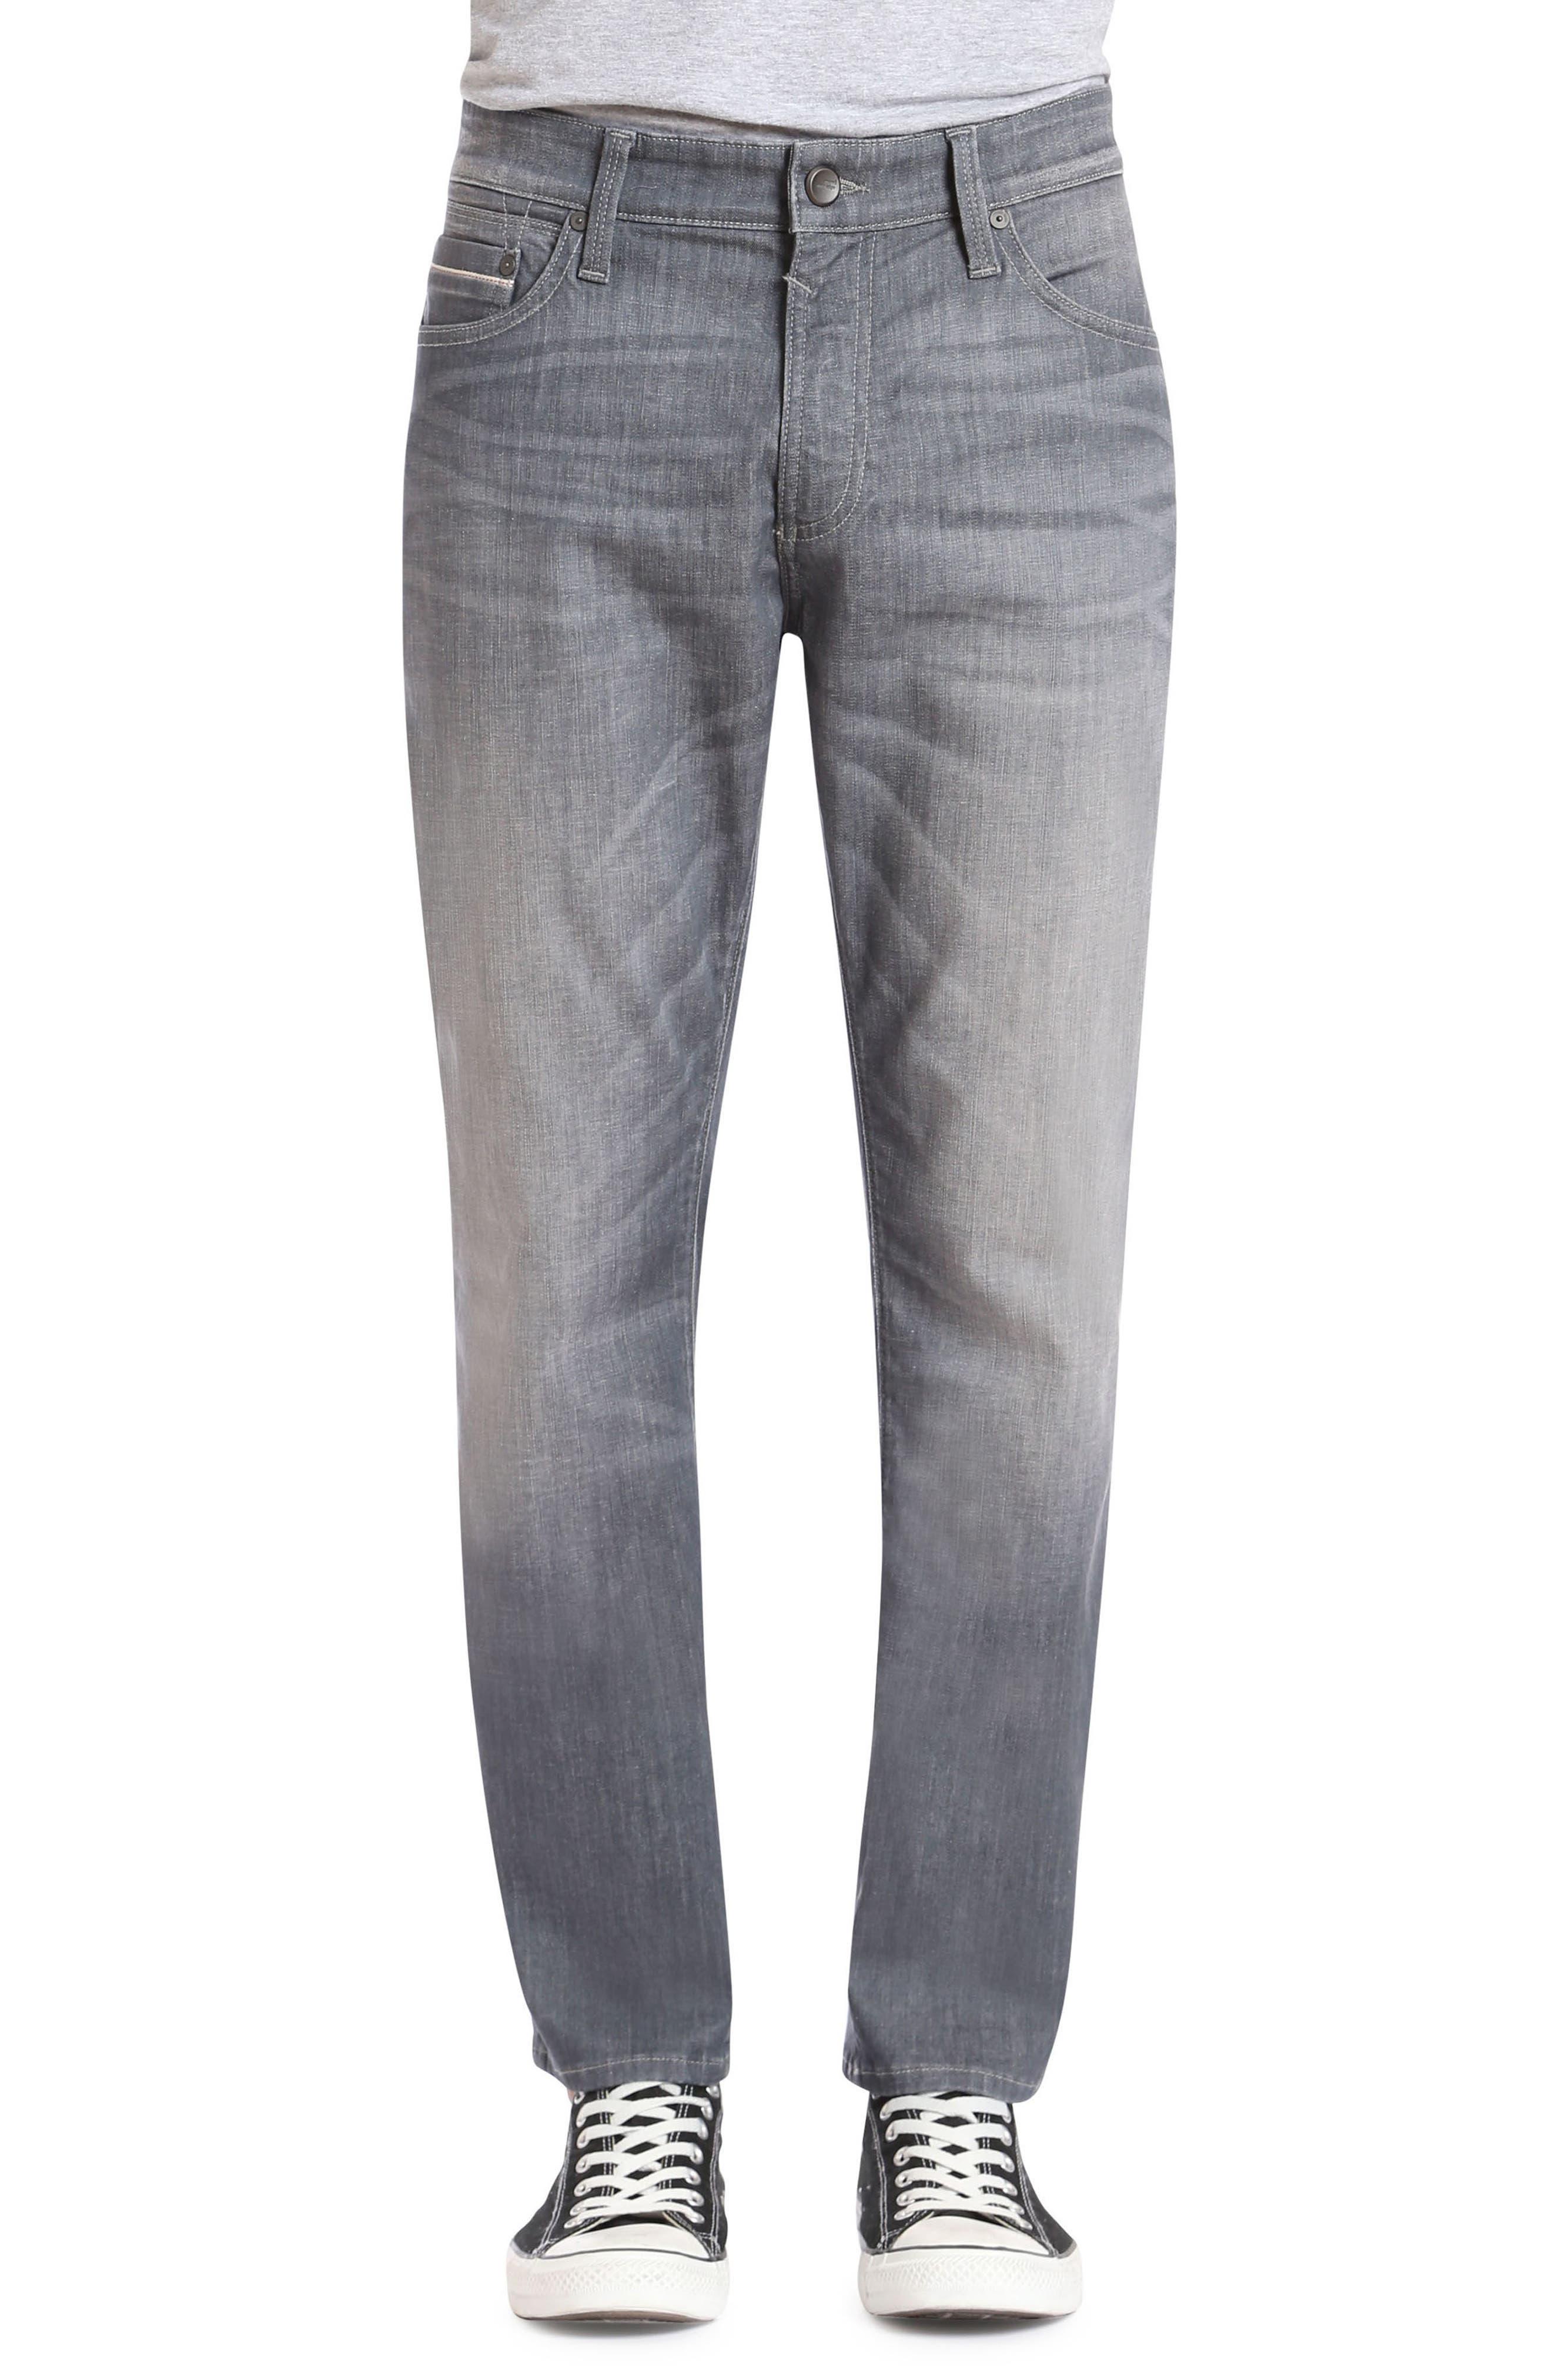 Main Image - Mavi Jeans Marcus Slim Straight Leg Jeans (Light Grey White Edge)